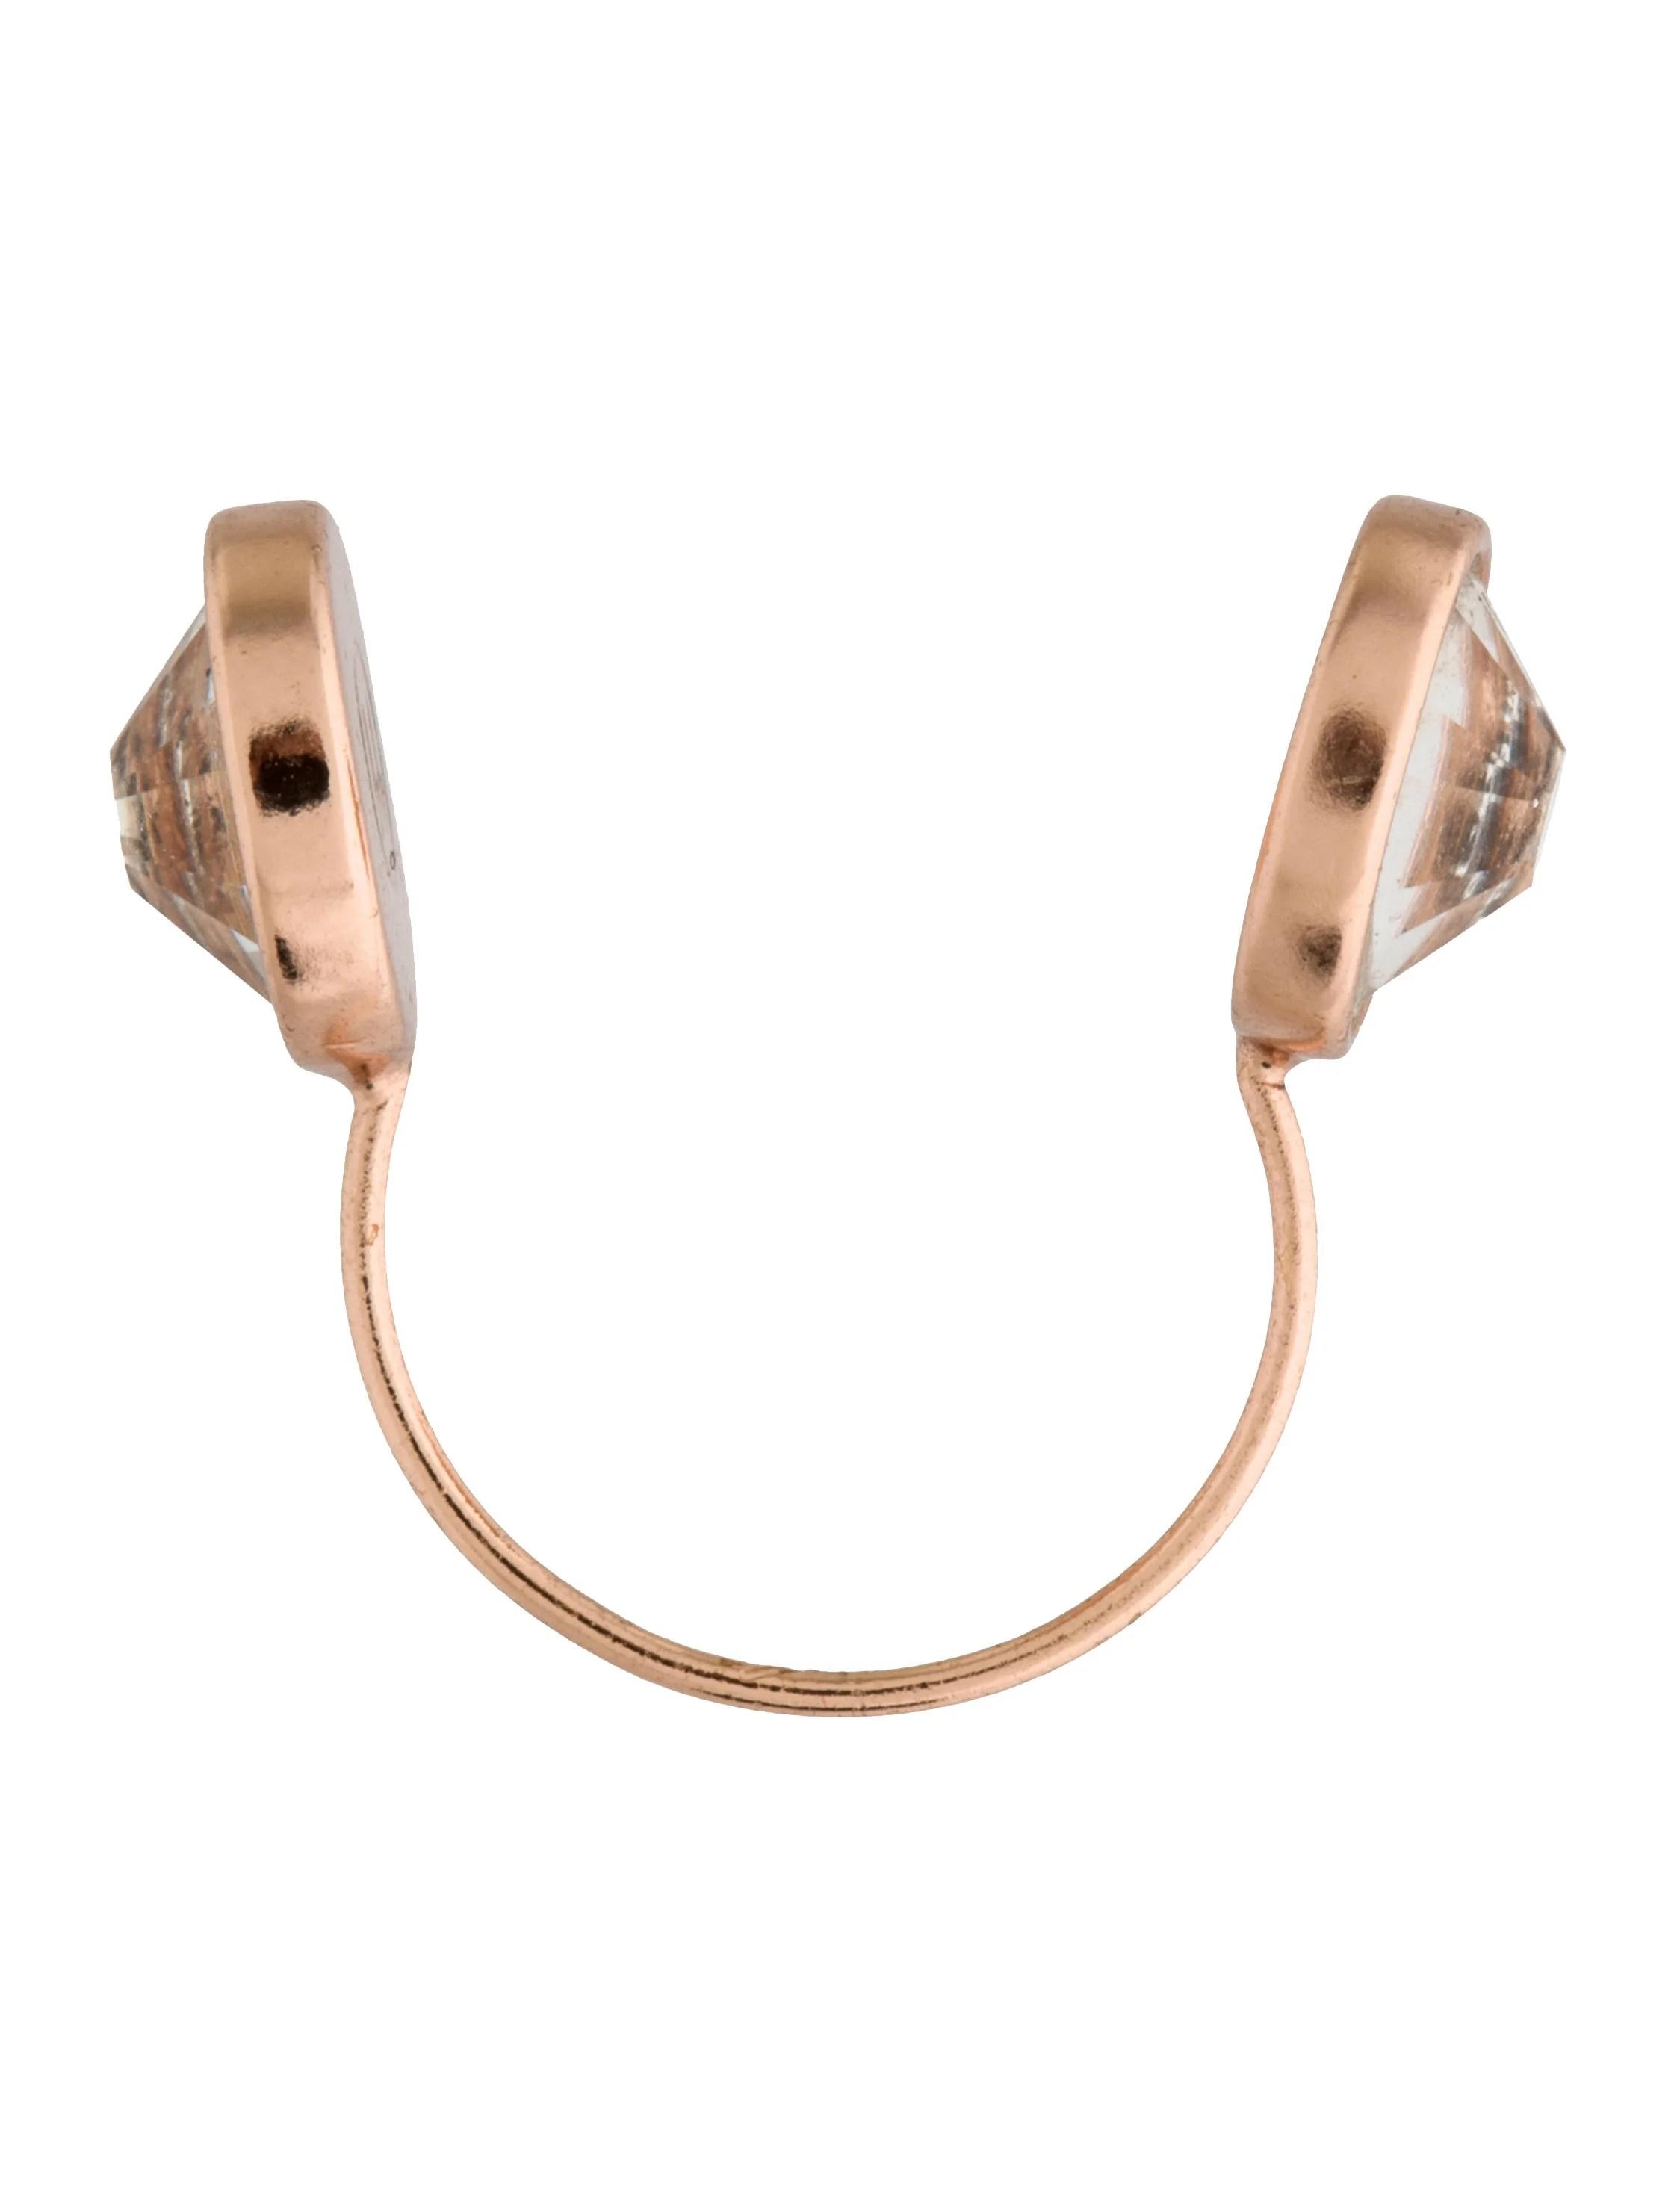 Maison Margiela Fine Nose Bridge Ring - Body Jewelry ...